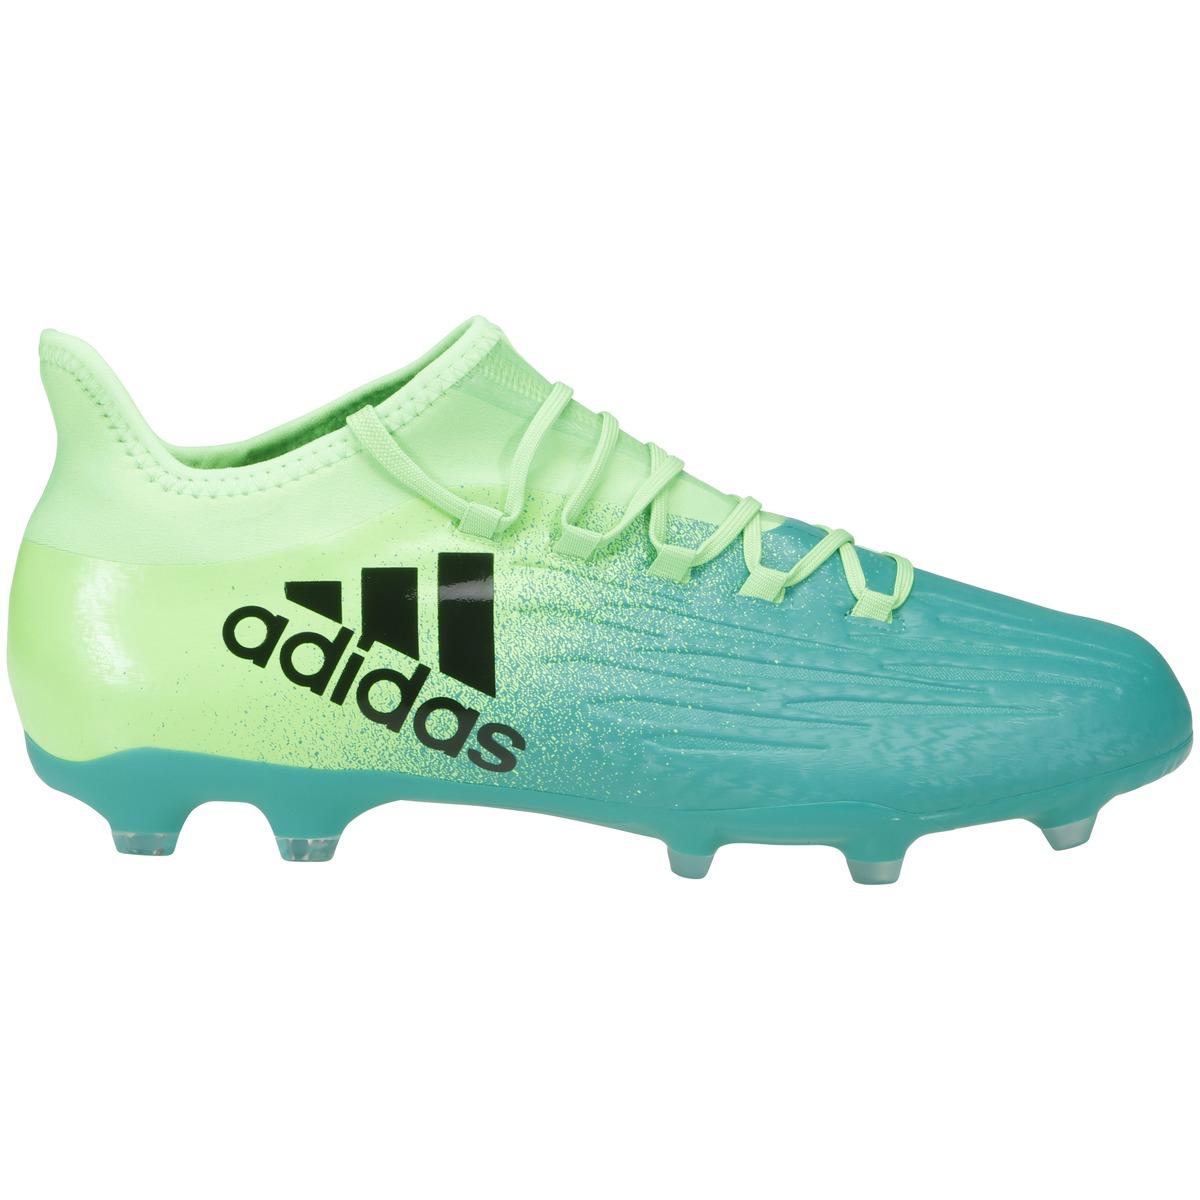 buy online 51be0 ceefd adidas x 16.2 fg ag q2 fotbollssko senior fotbollsskor